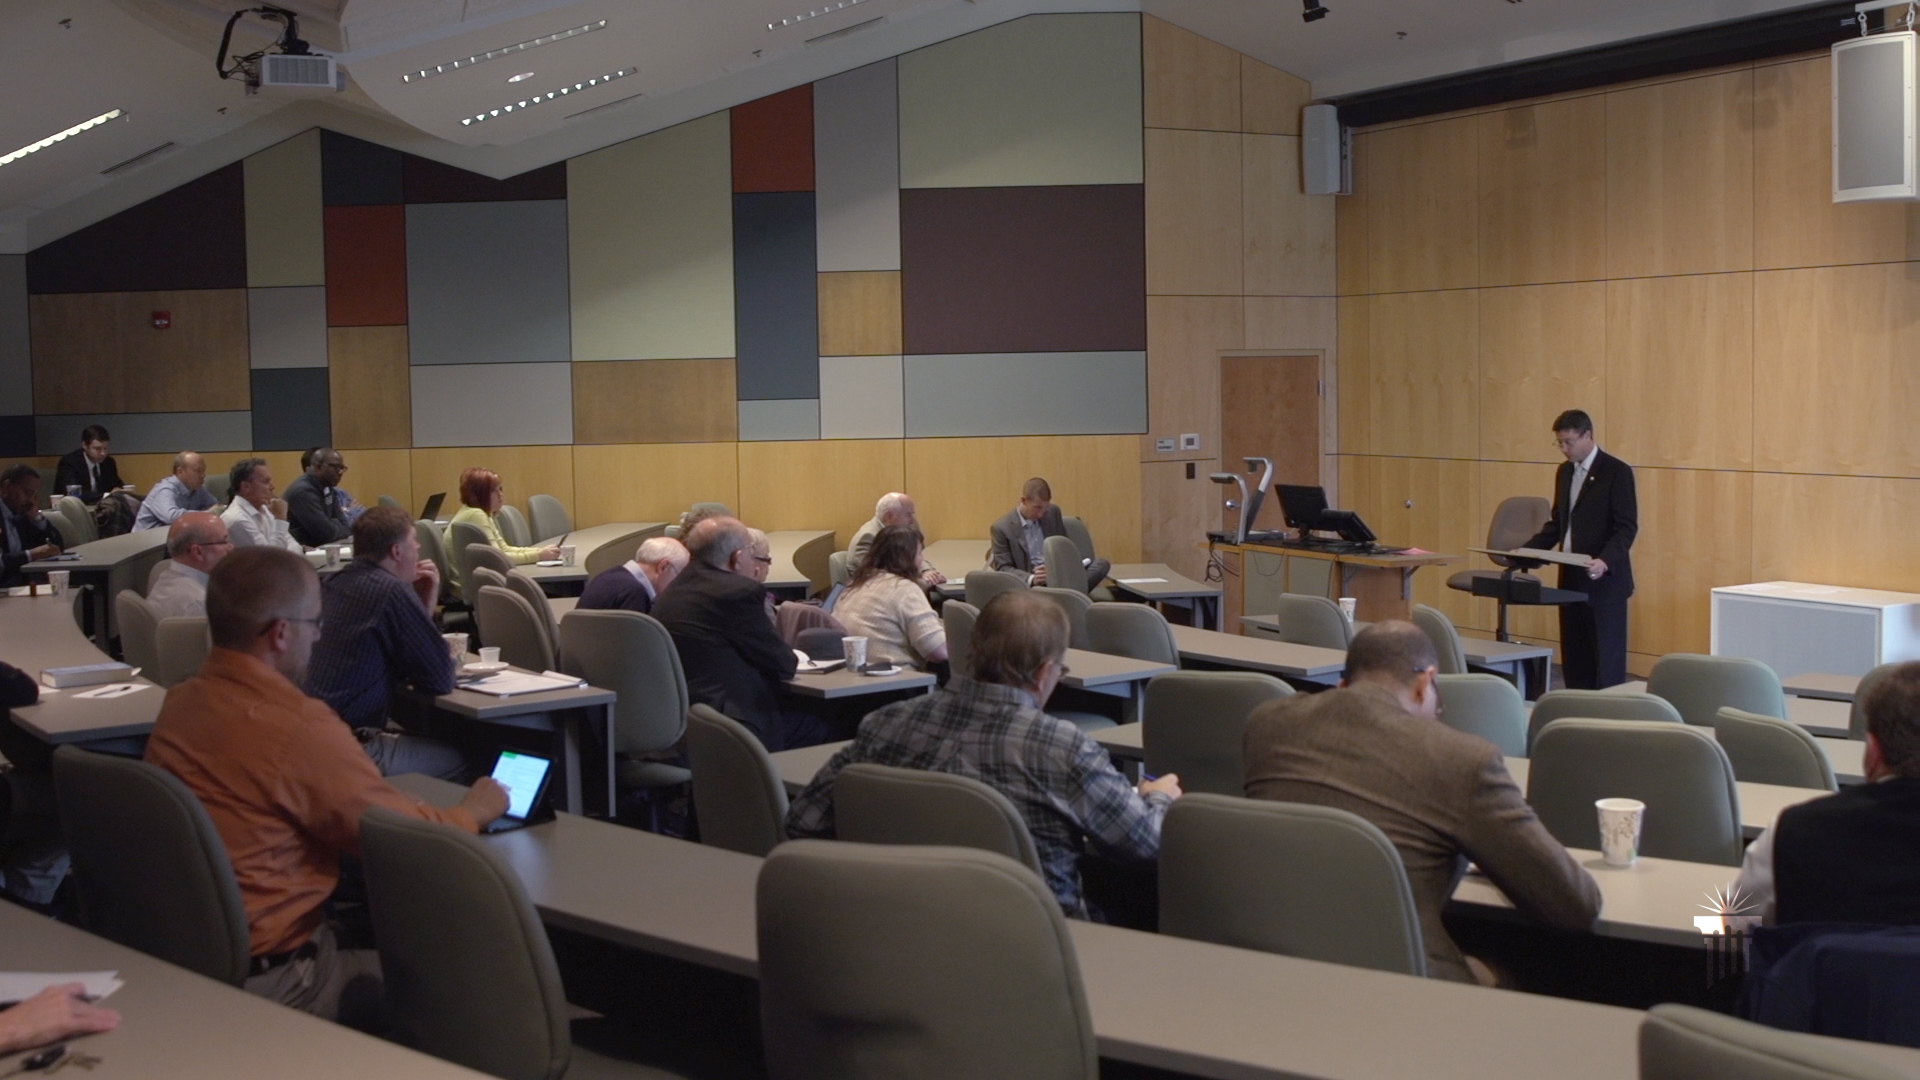 View thumbnail for Dr. Thomas Mach - Biblical Integration Presentation, Fall 2016